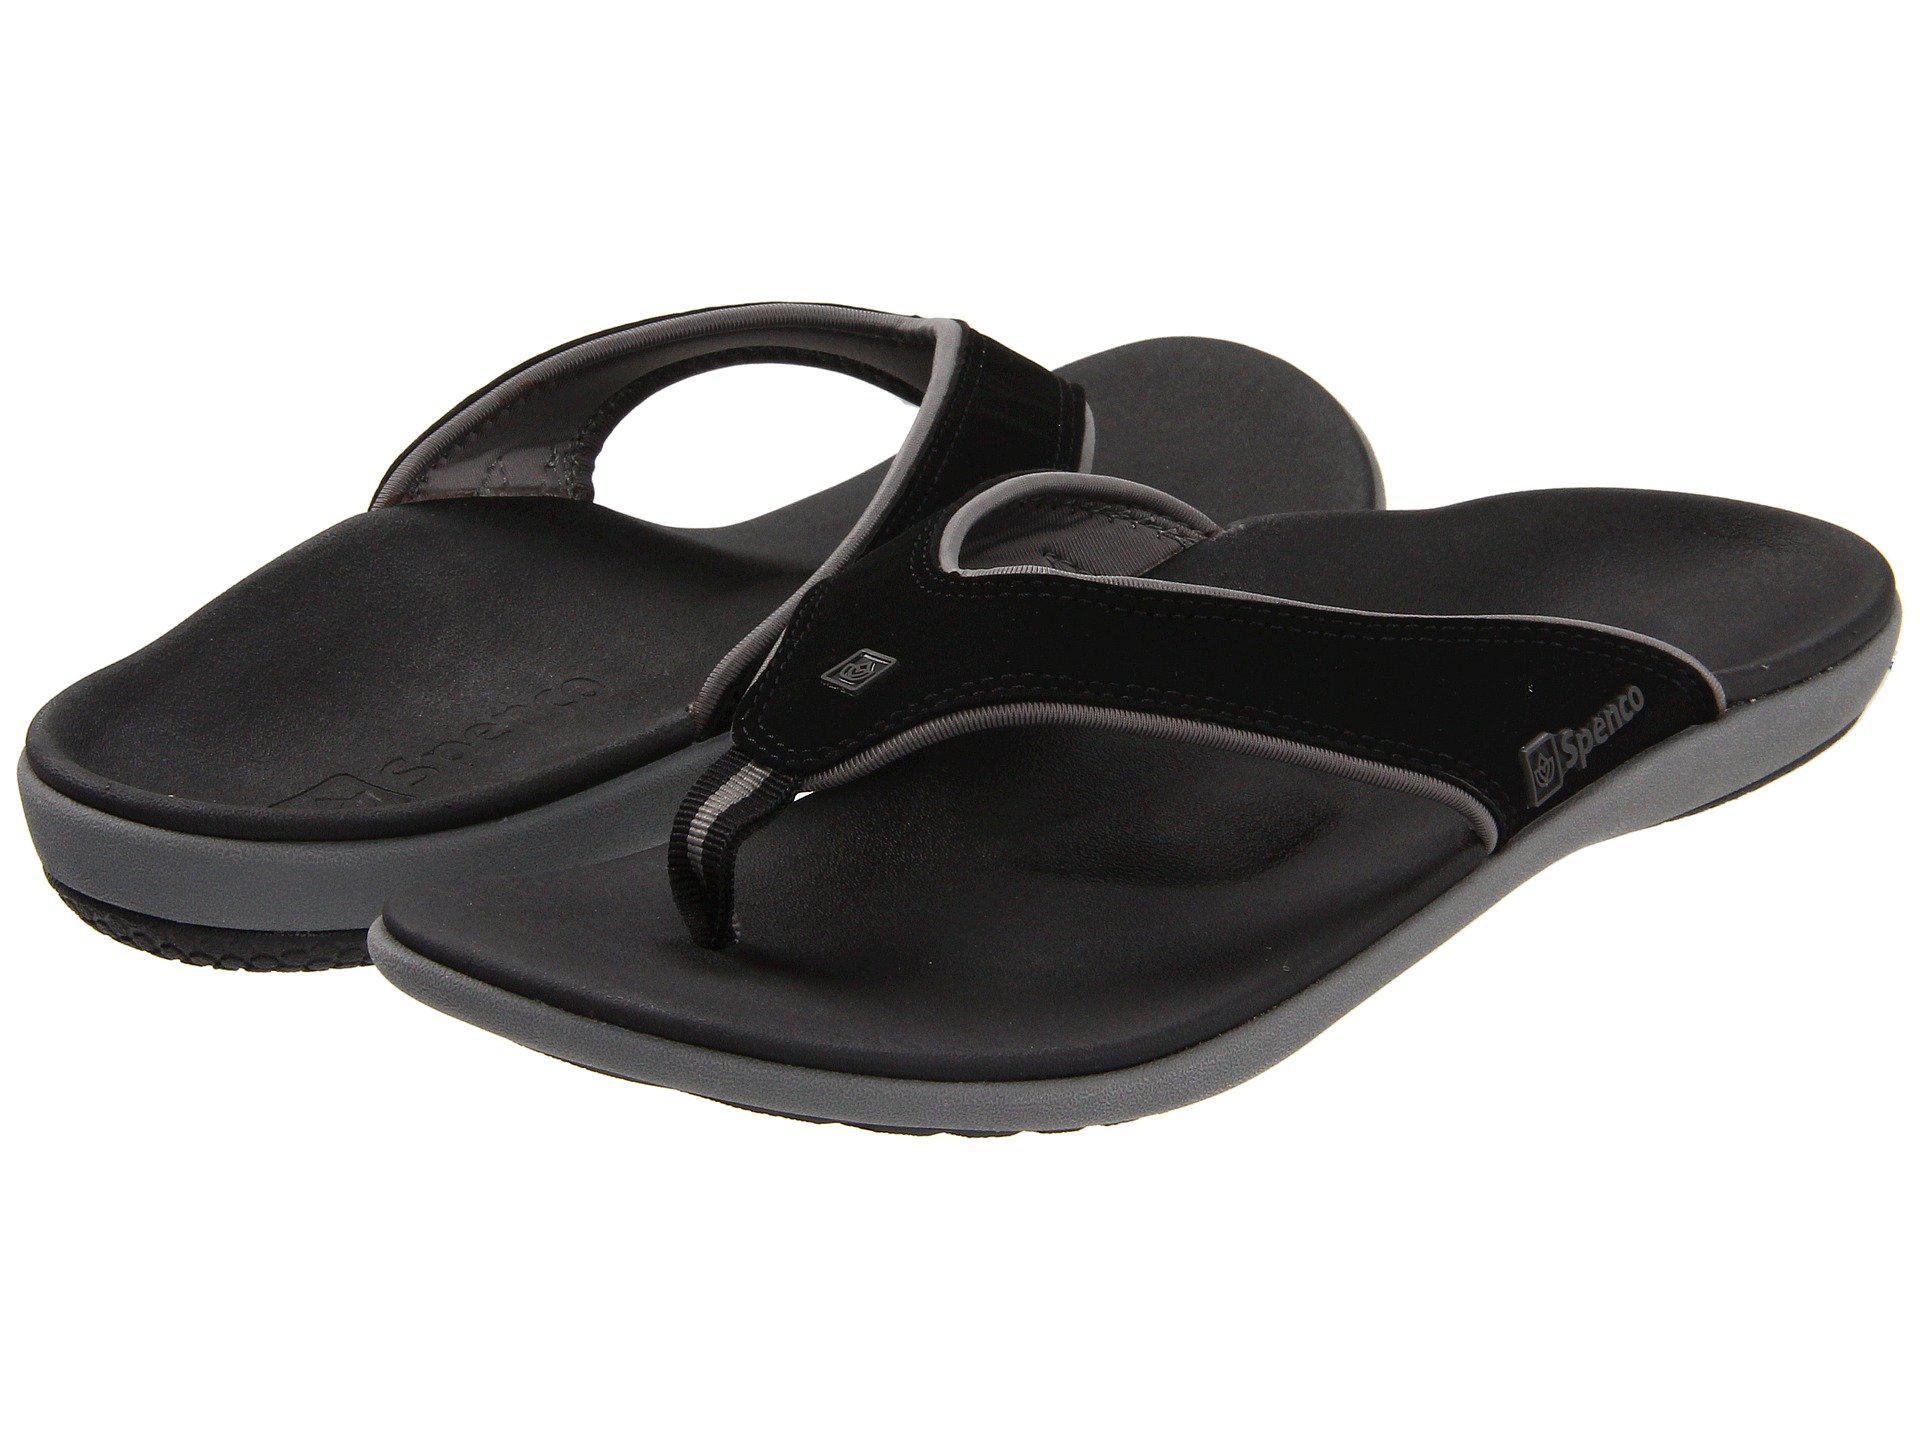 859455a232b Spenco - Black Yumi (dark Brown) Men s Sandals for Men - Lyst. View  fullscreen